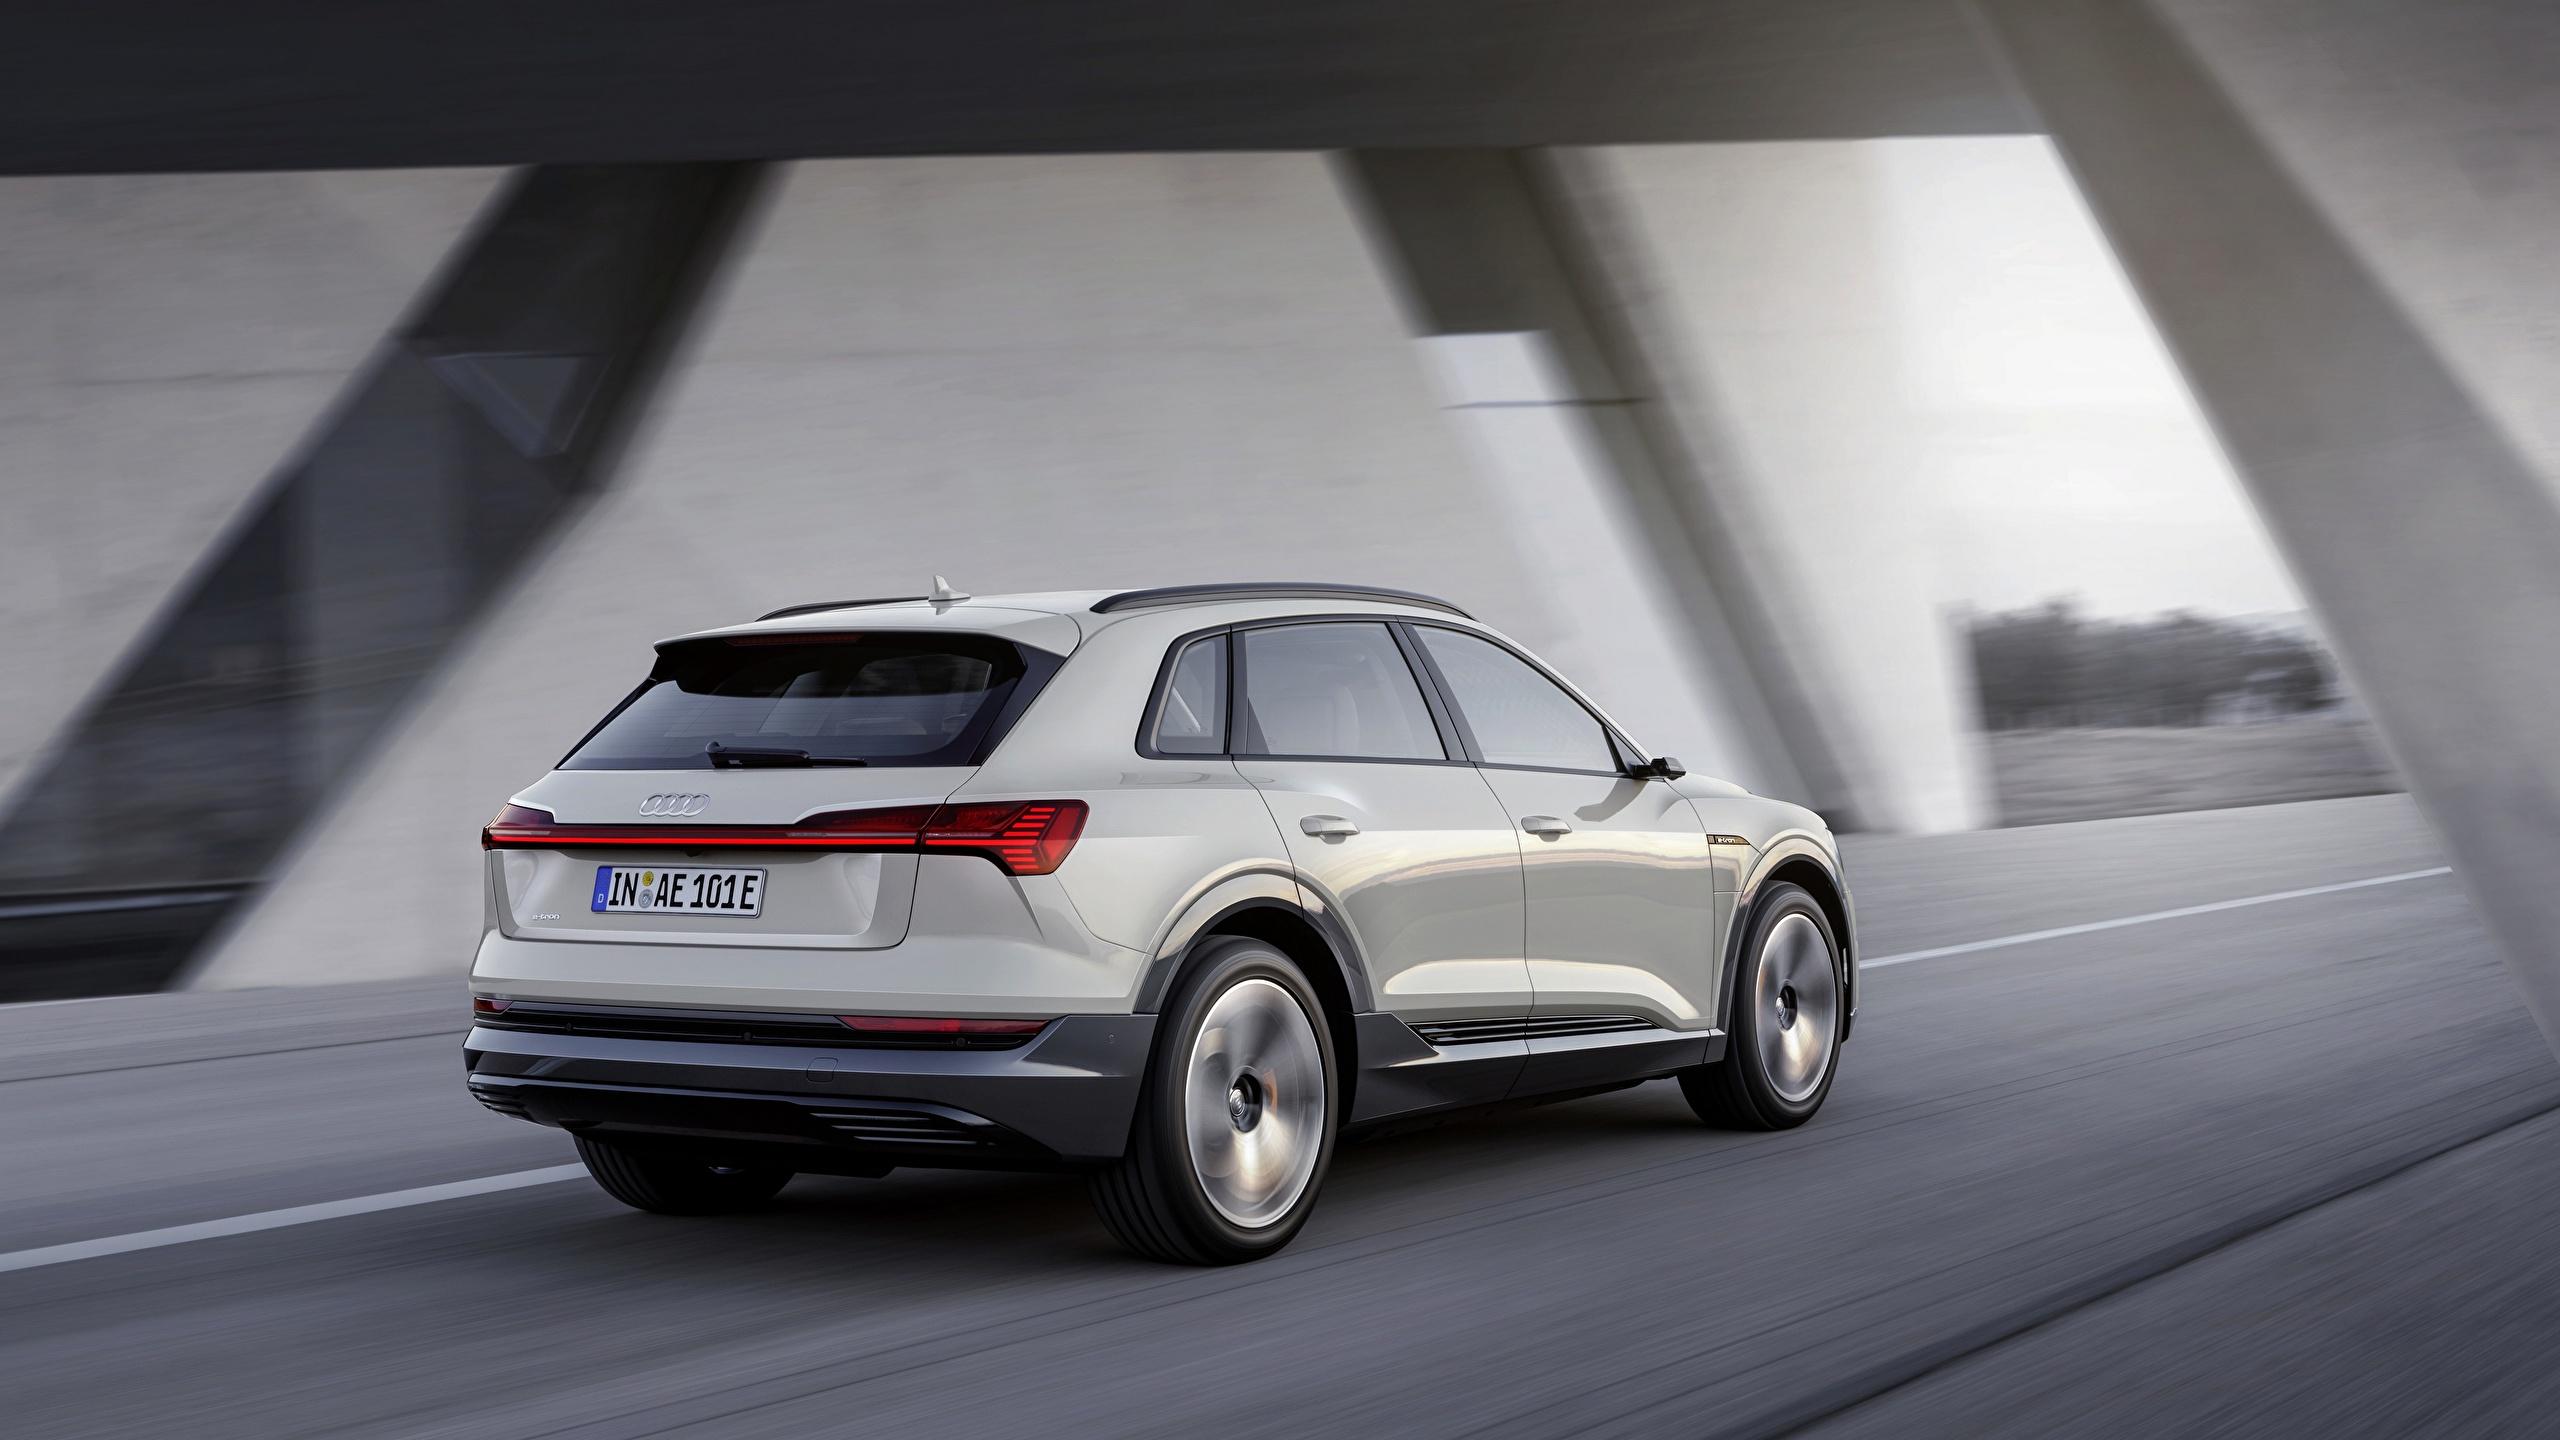 Wallpaper Audi E Tron 2019 White Driving Auto 2560x1440